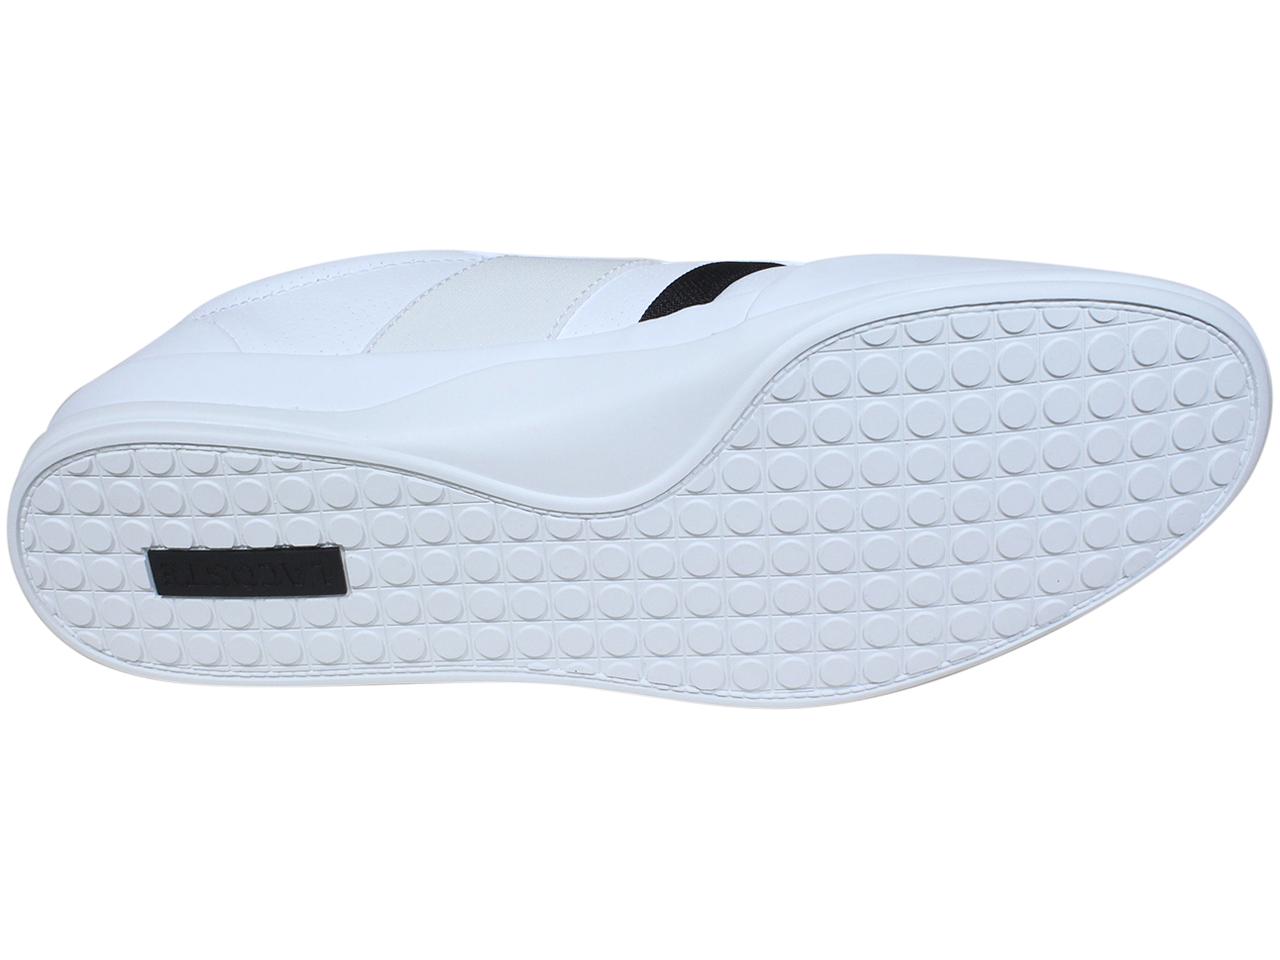 Lacoste-Misano-Elastic-318-Sneakers-Men-039-s-Low-Top-Shoes thumbnail 28